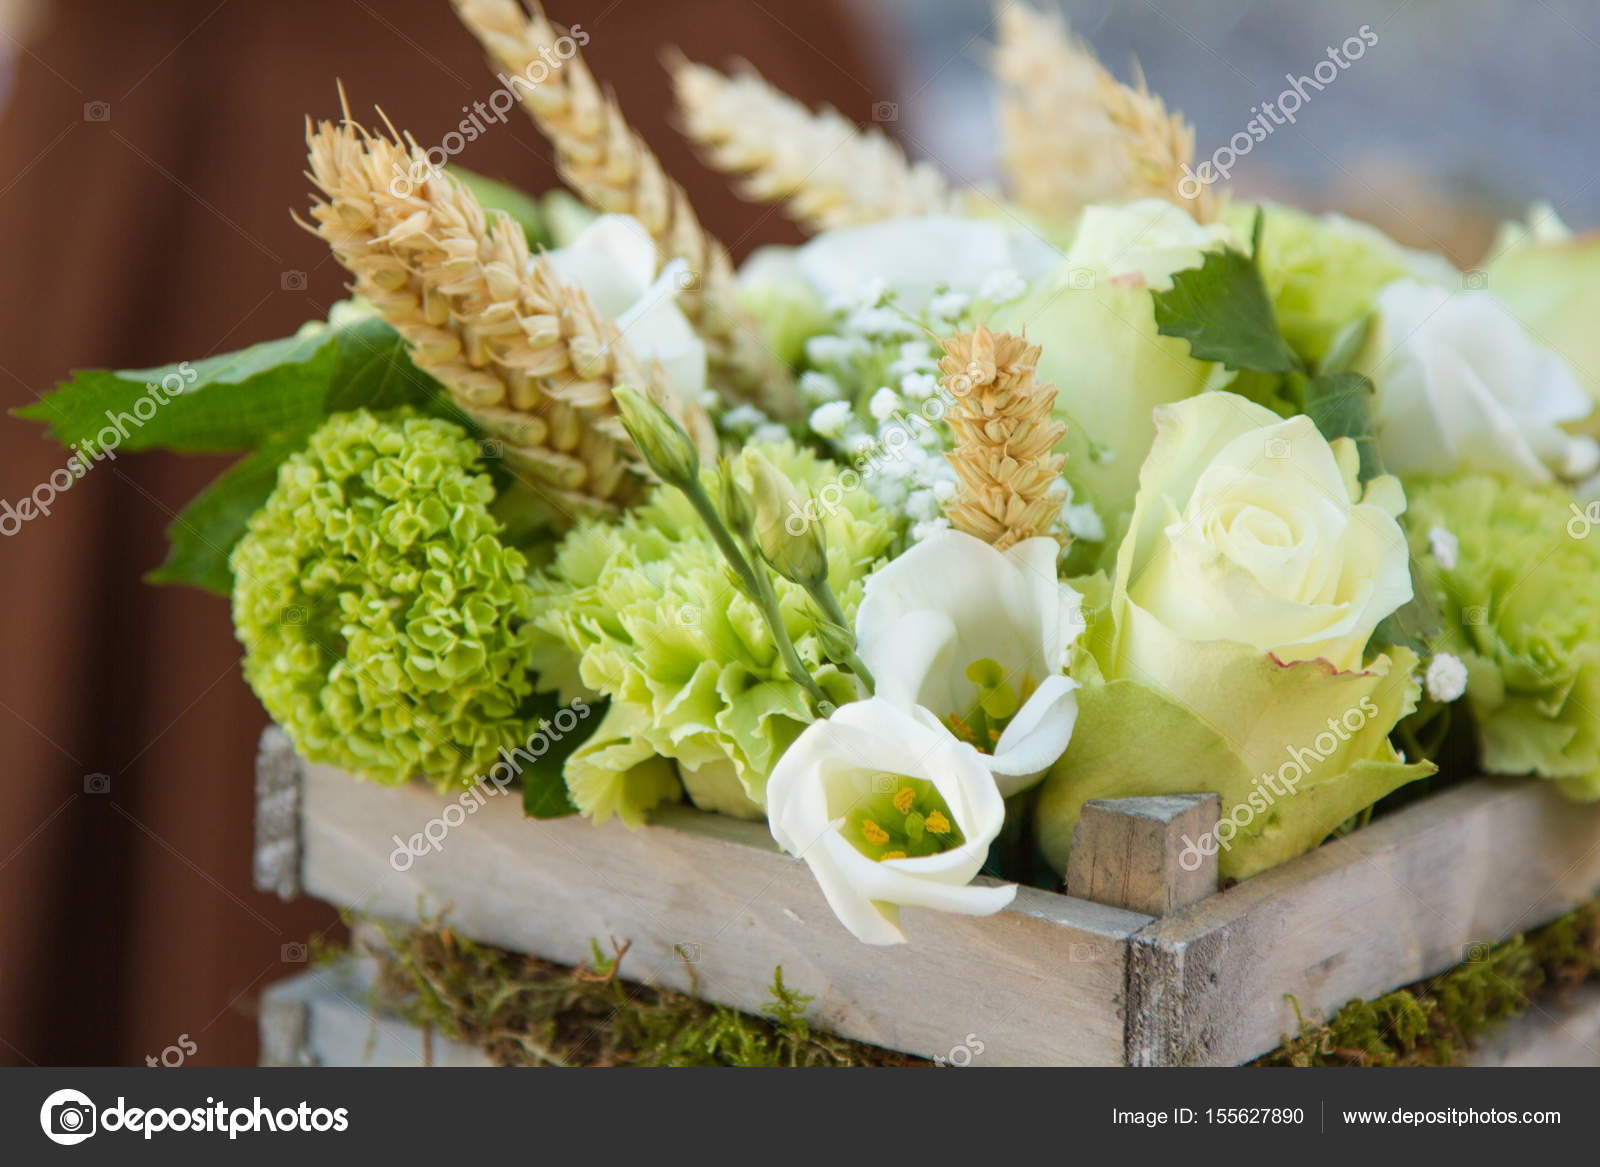 294146f0fcb0 Στολισμός γάμου με λουλούδια — Φωτογραφία Αρχείου · Ένα λουλούδια γάμου  διακόσμηση — Εικόνα από ...